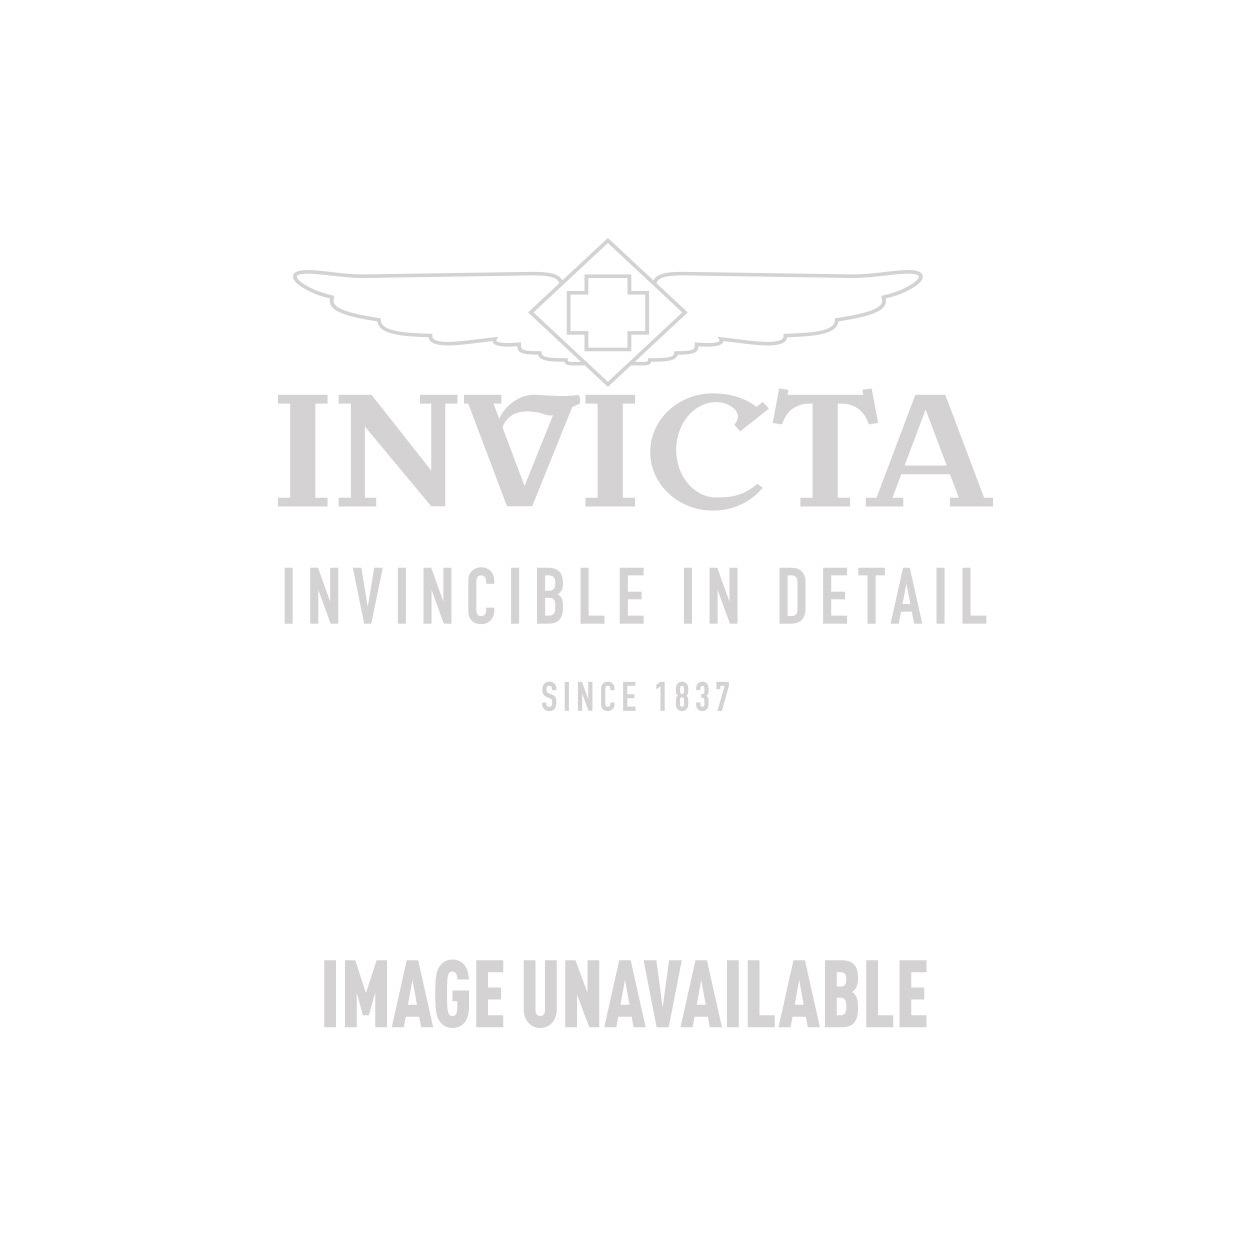 0cd505751 Invicta Akula Swiss Made Mens Quartz 55.7mm Black Case Black Dial - Model  26049